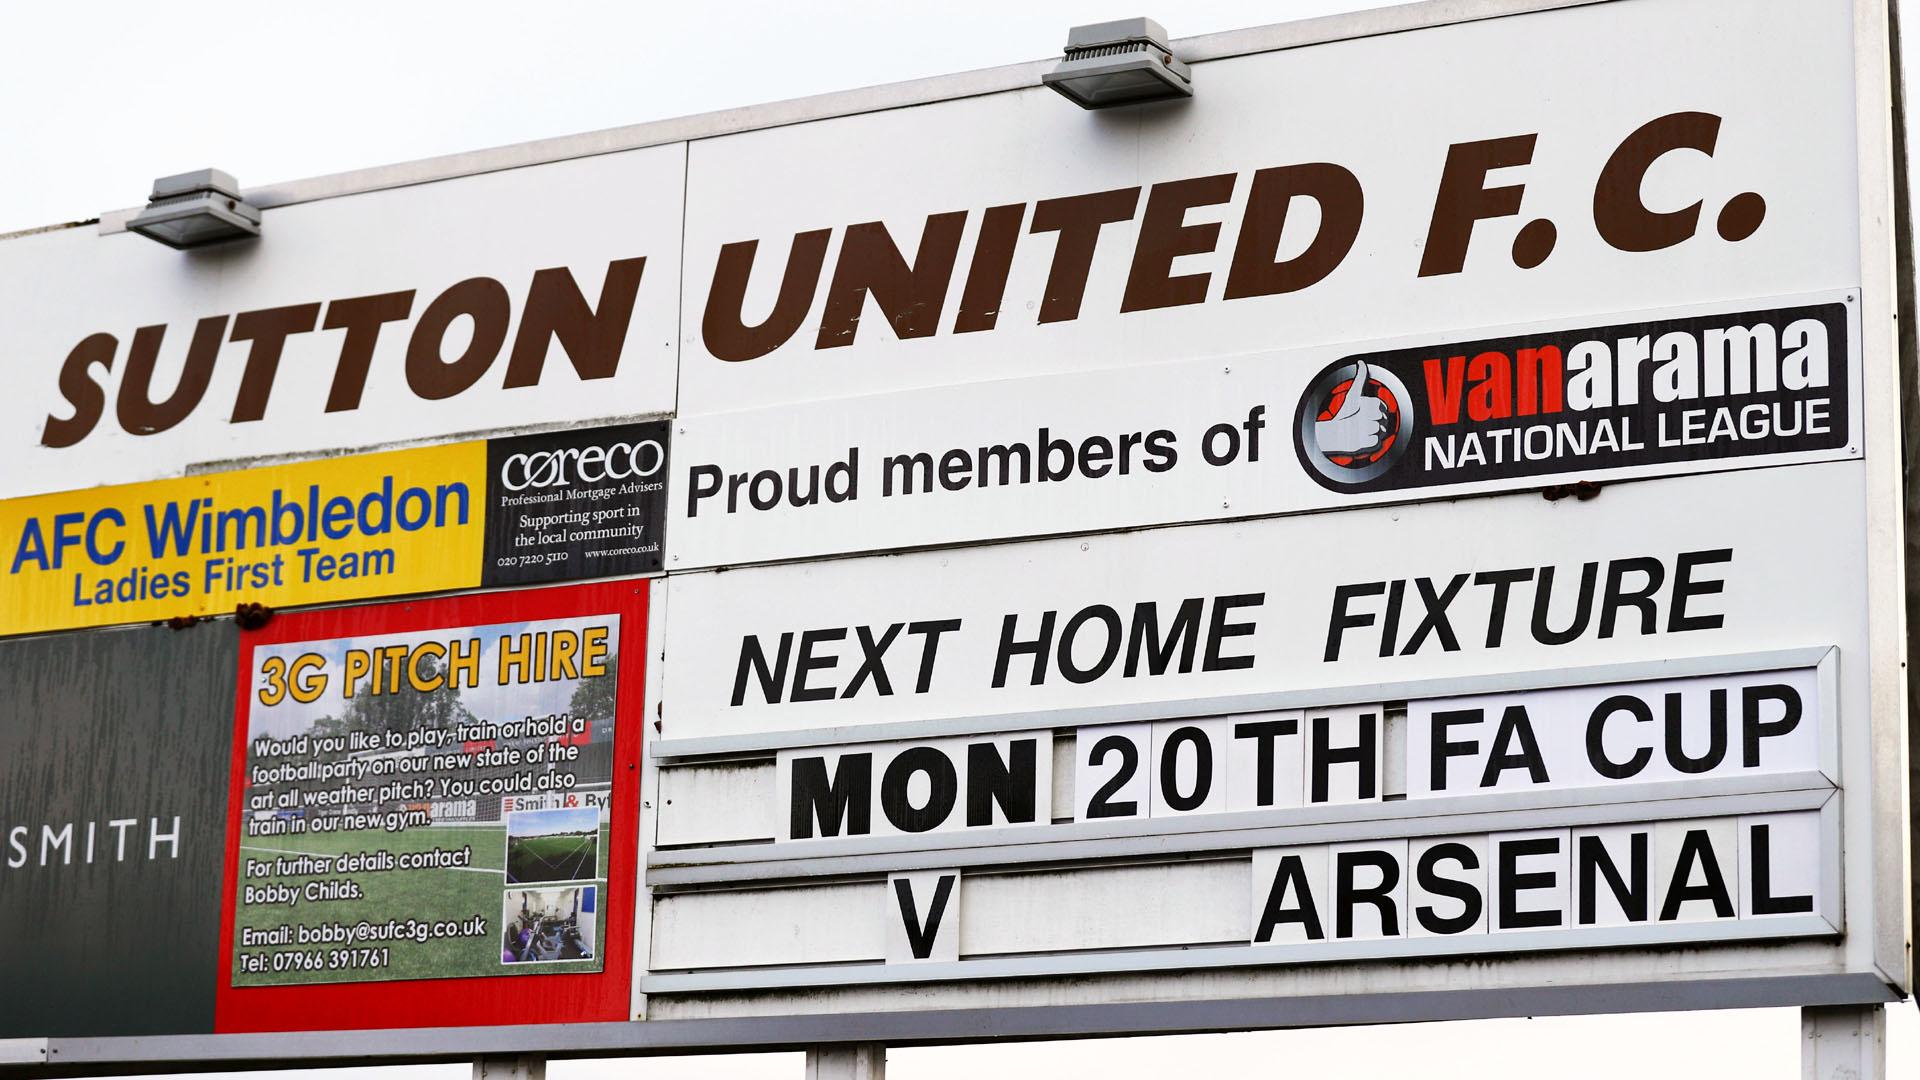 Sutton United recebe o Arsenal pela Copa da Inglaterra (Photo by Ian Walton/Getty Images)